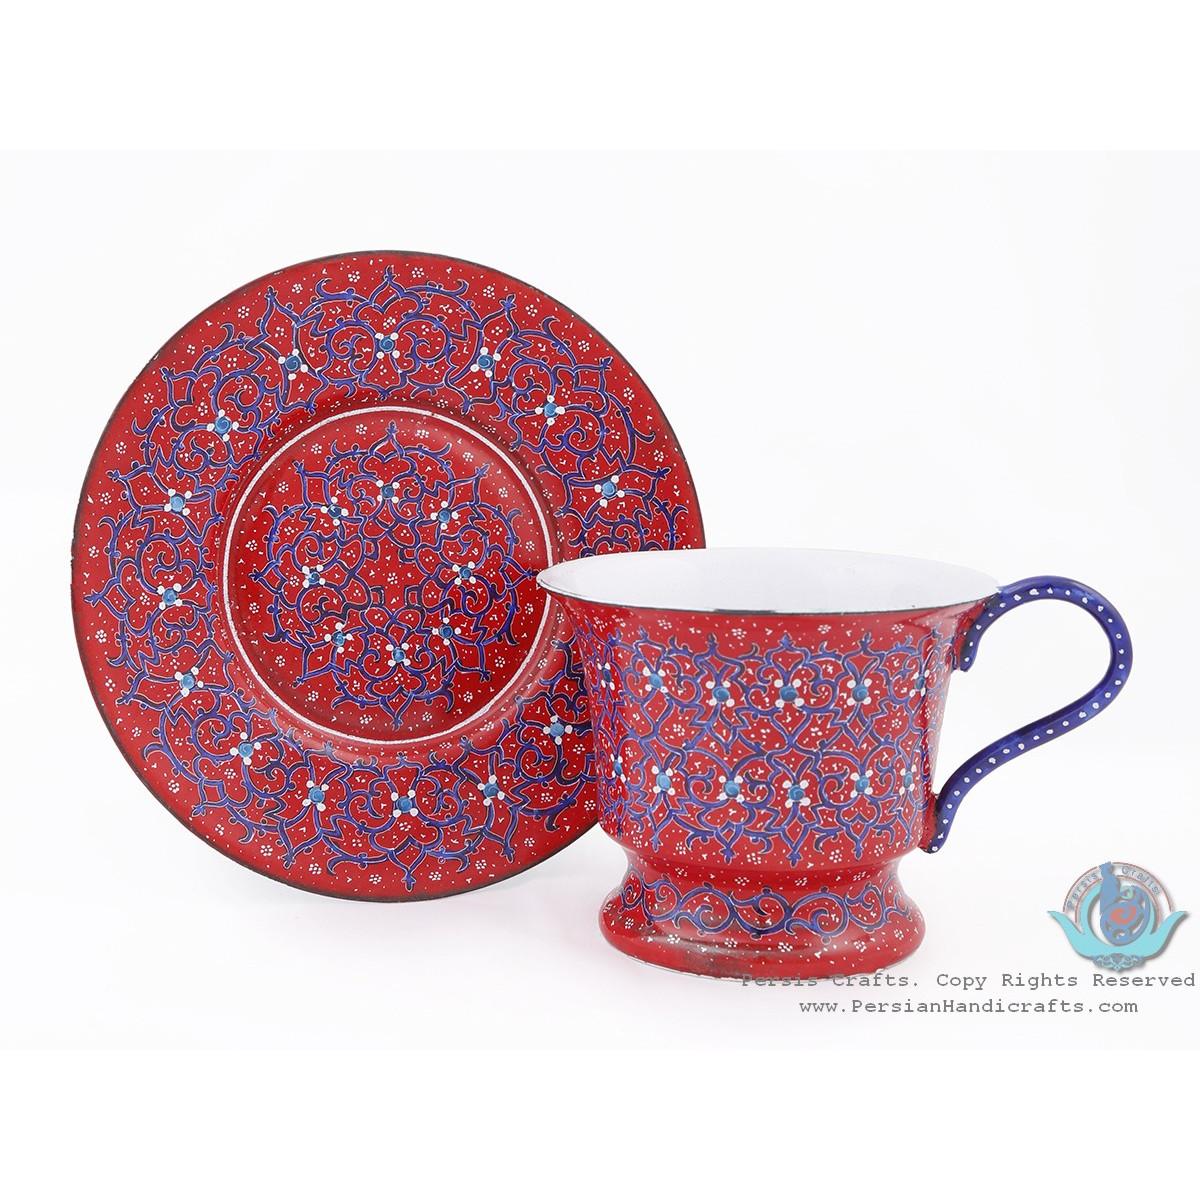 Enamel (Minakari) Tea Cup & Saucer - HE3803-Persian Handicrafts